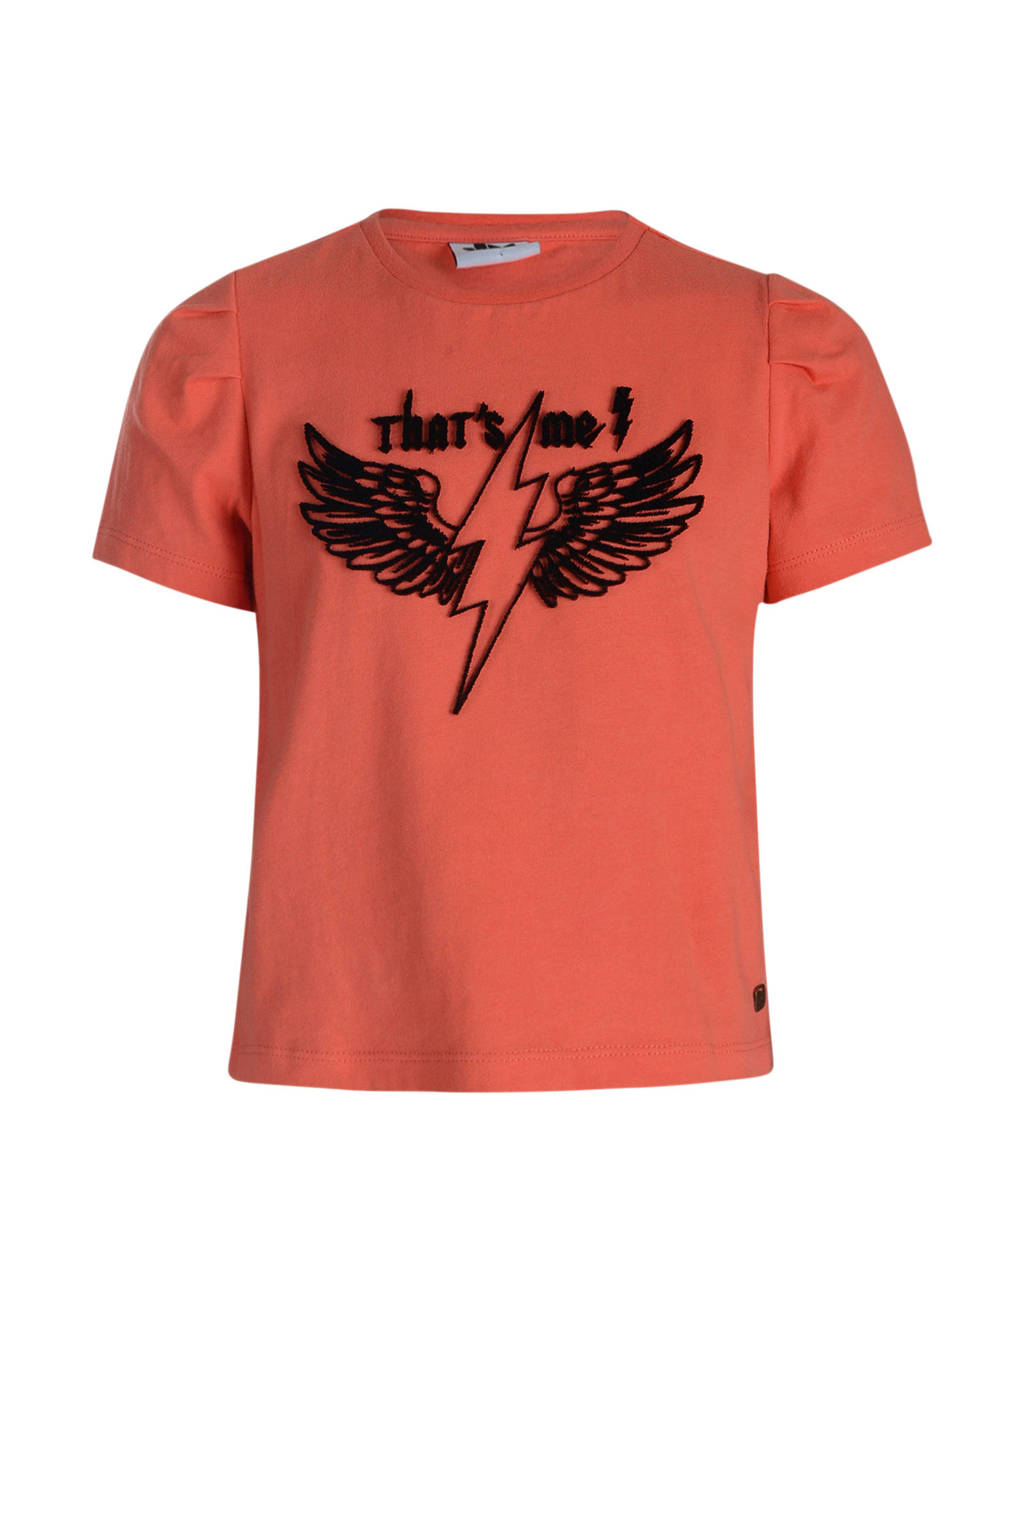 Jill & Mitch by Shoeby T-shirt met printopdruk donker oudroze, Donker oudroze